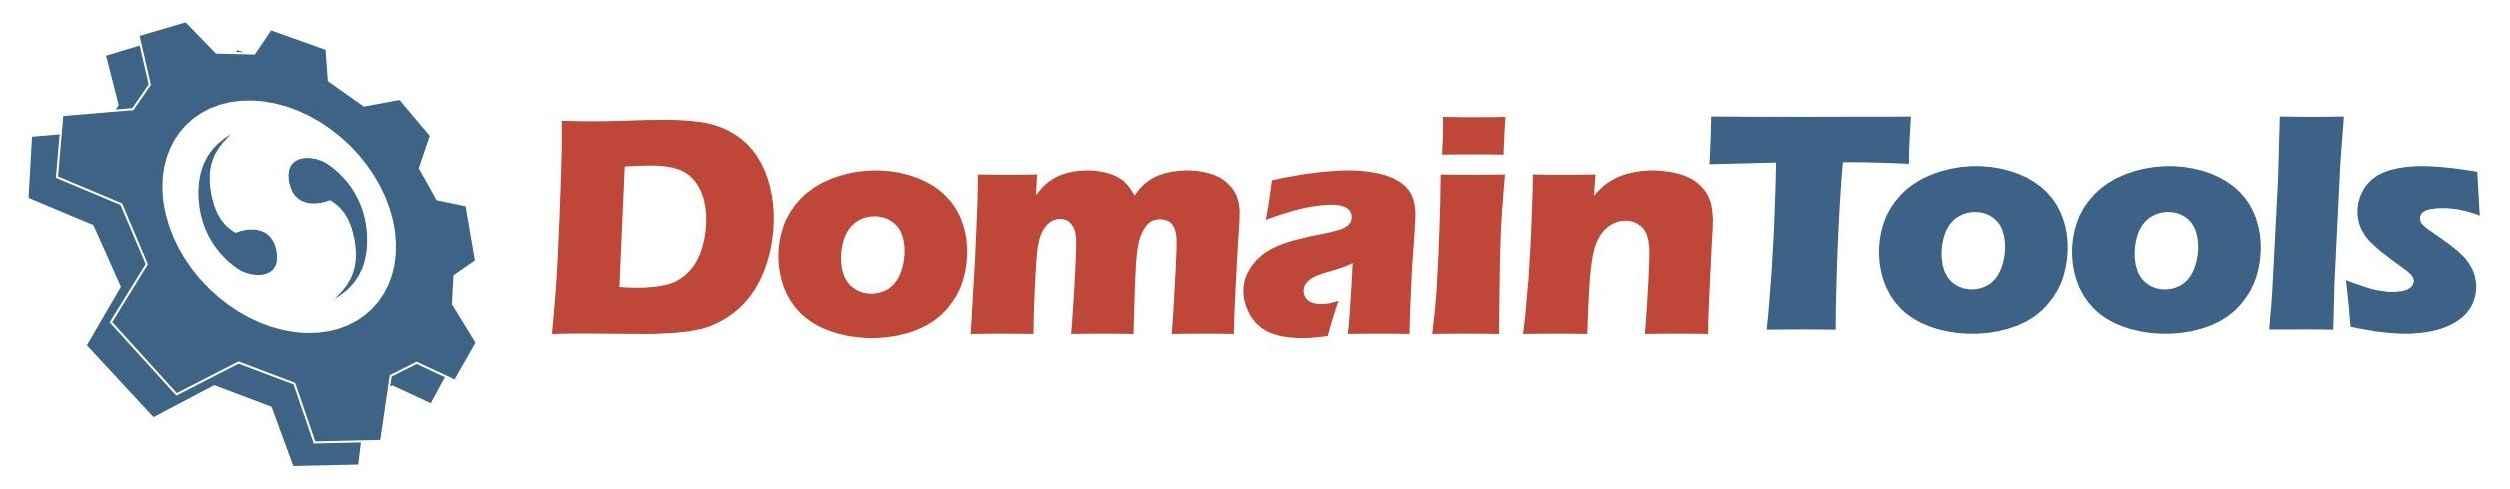 DomainTools.com-Logo